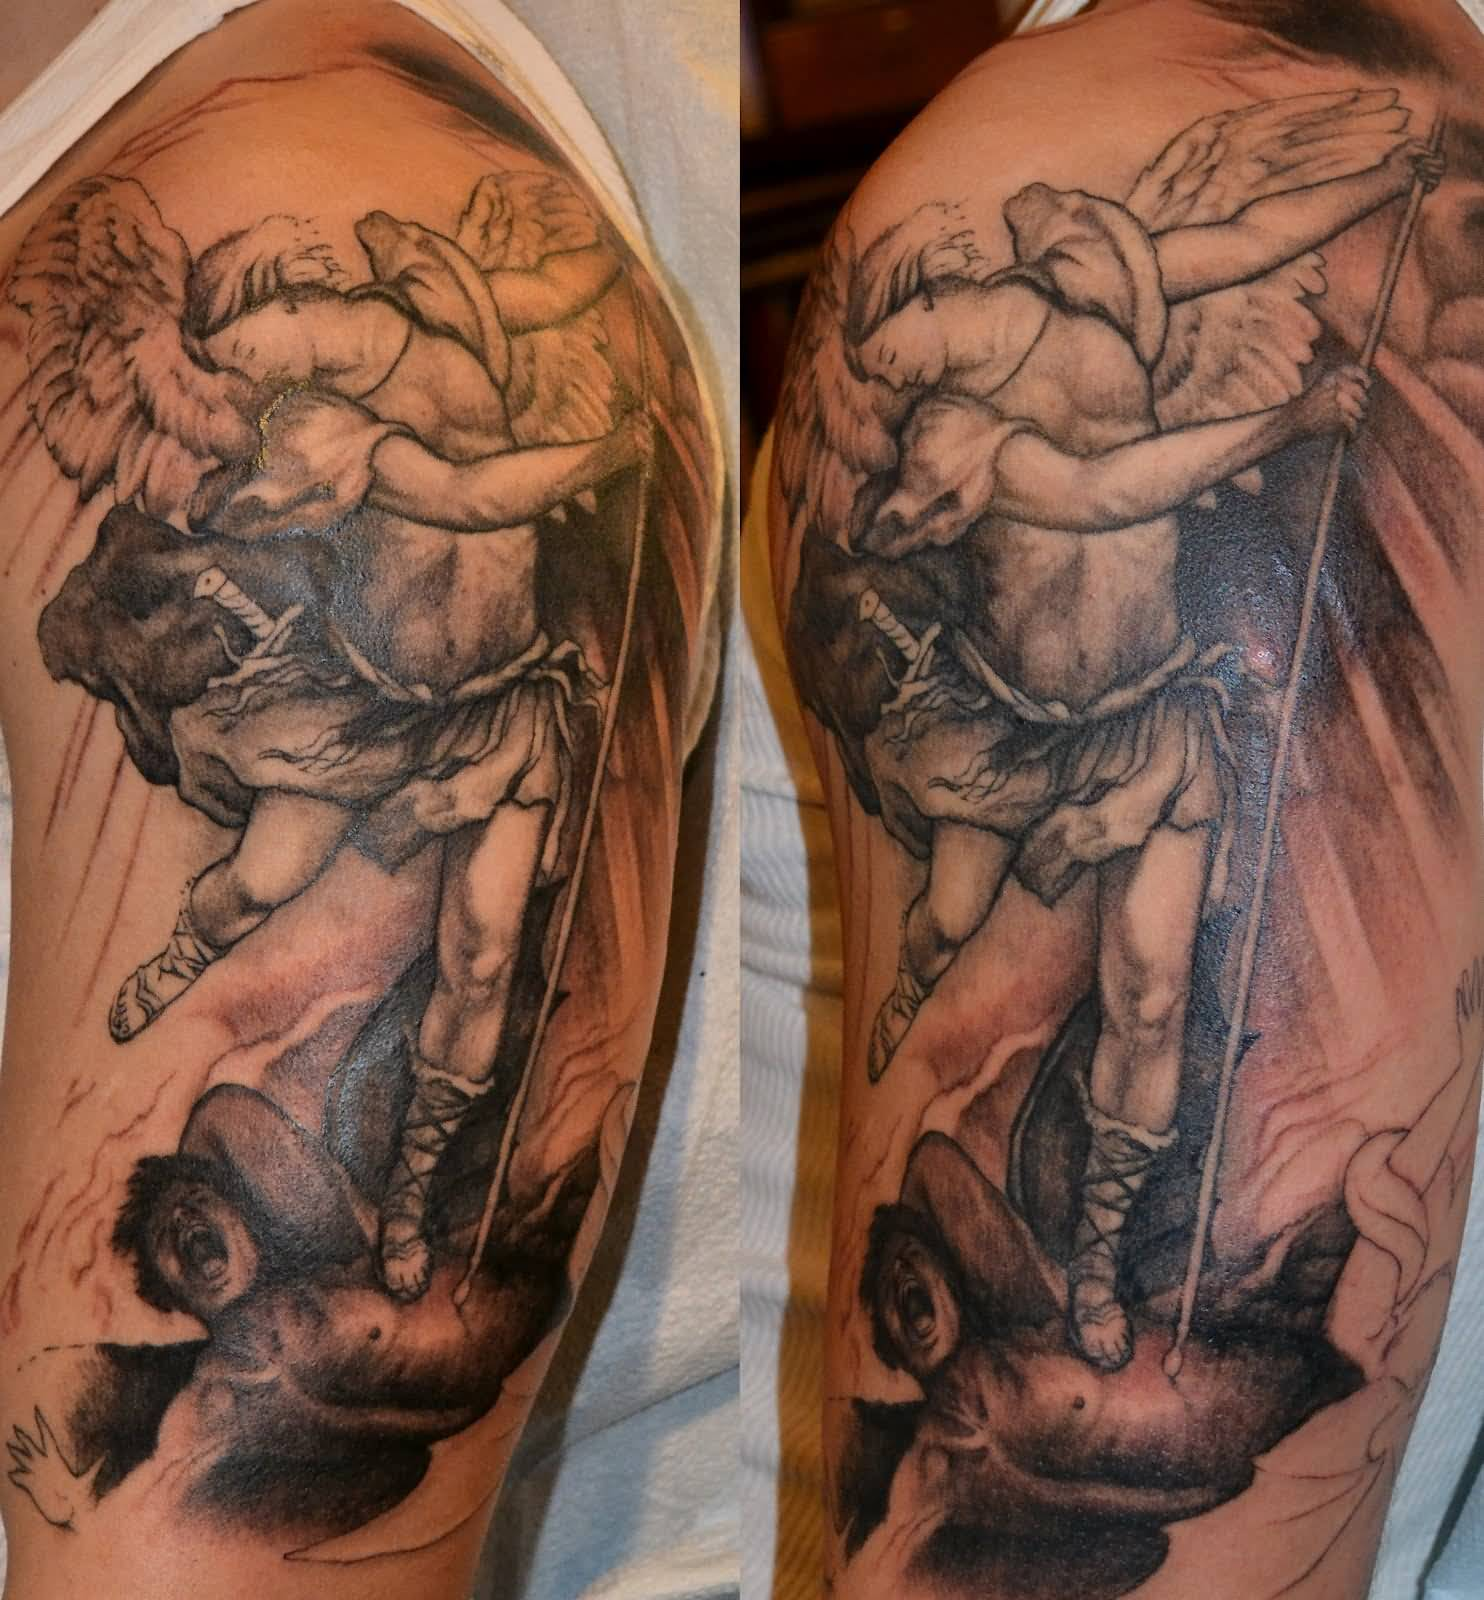 Good Vs Evil Tattoos